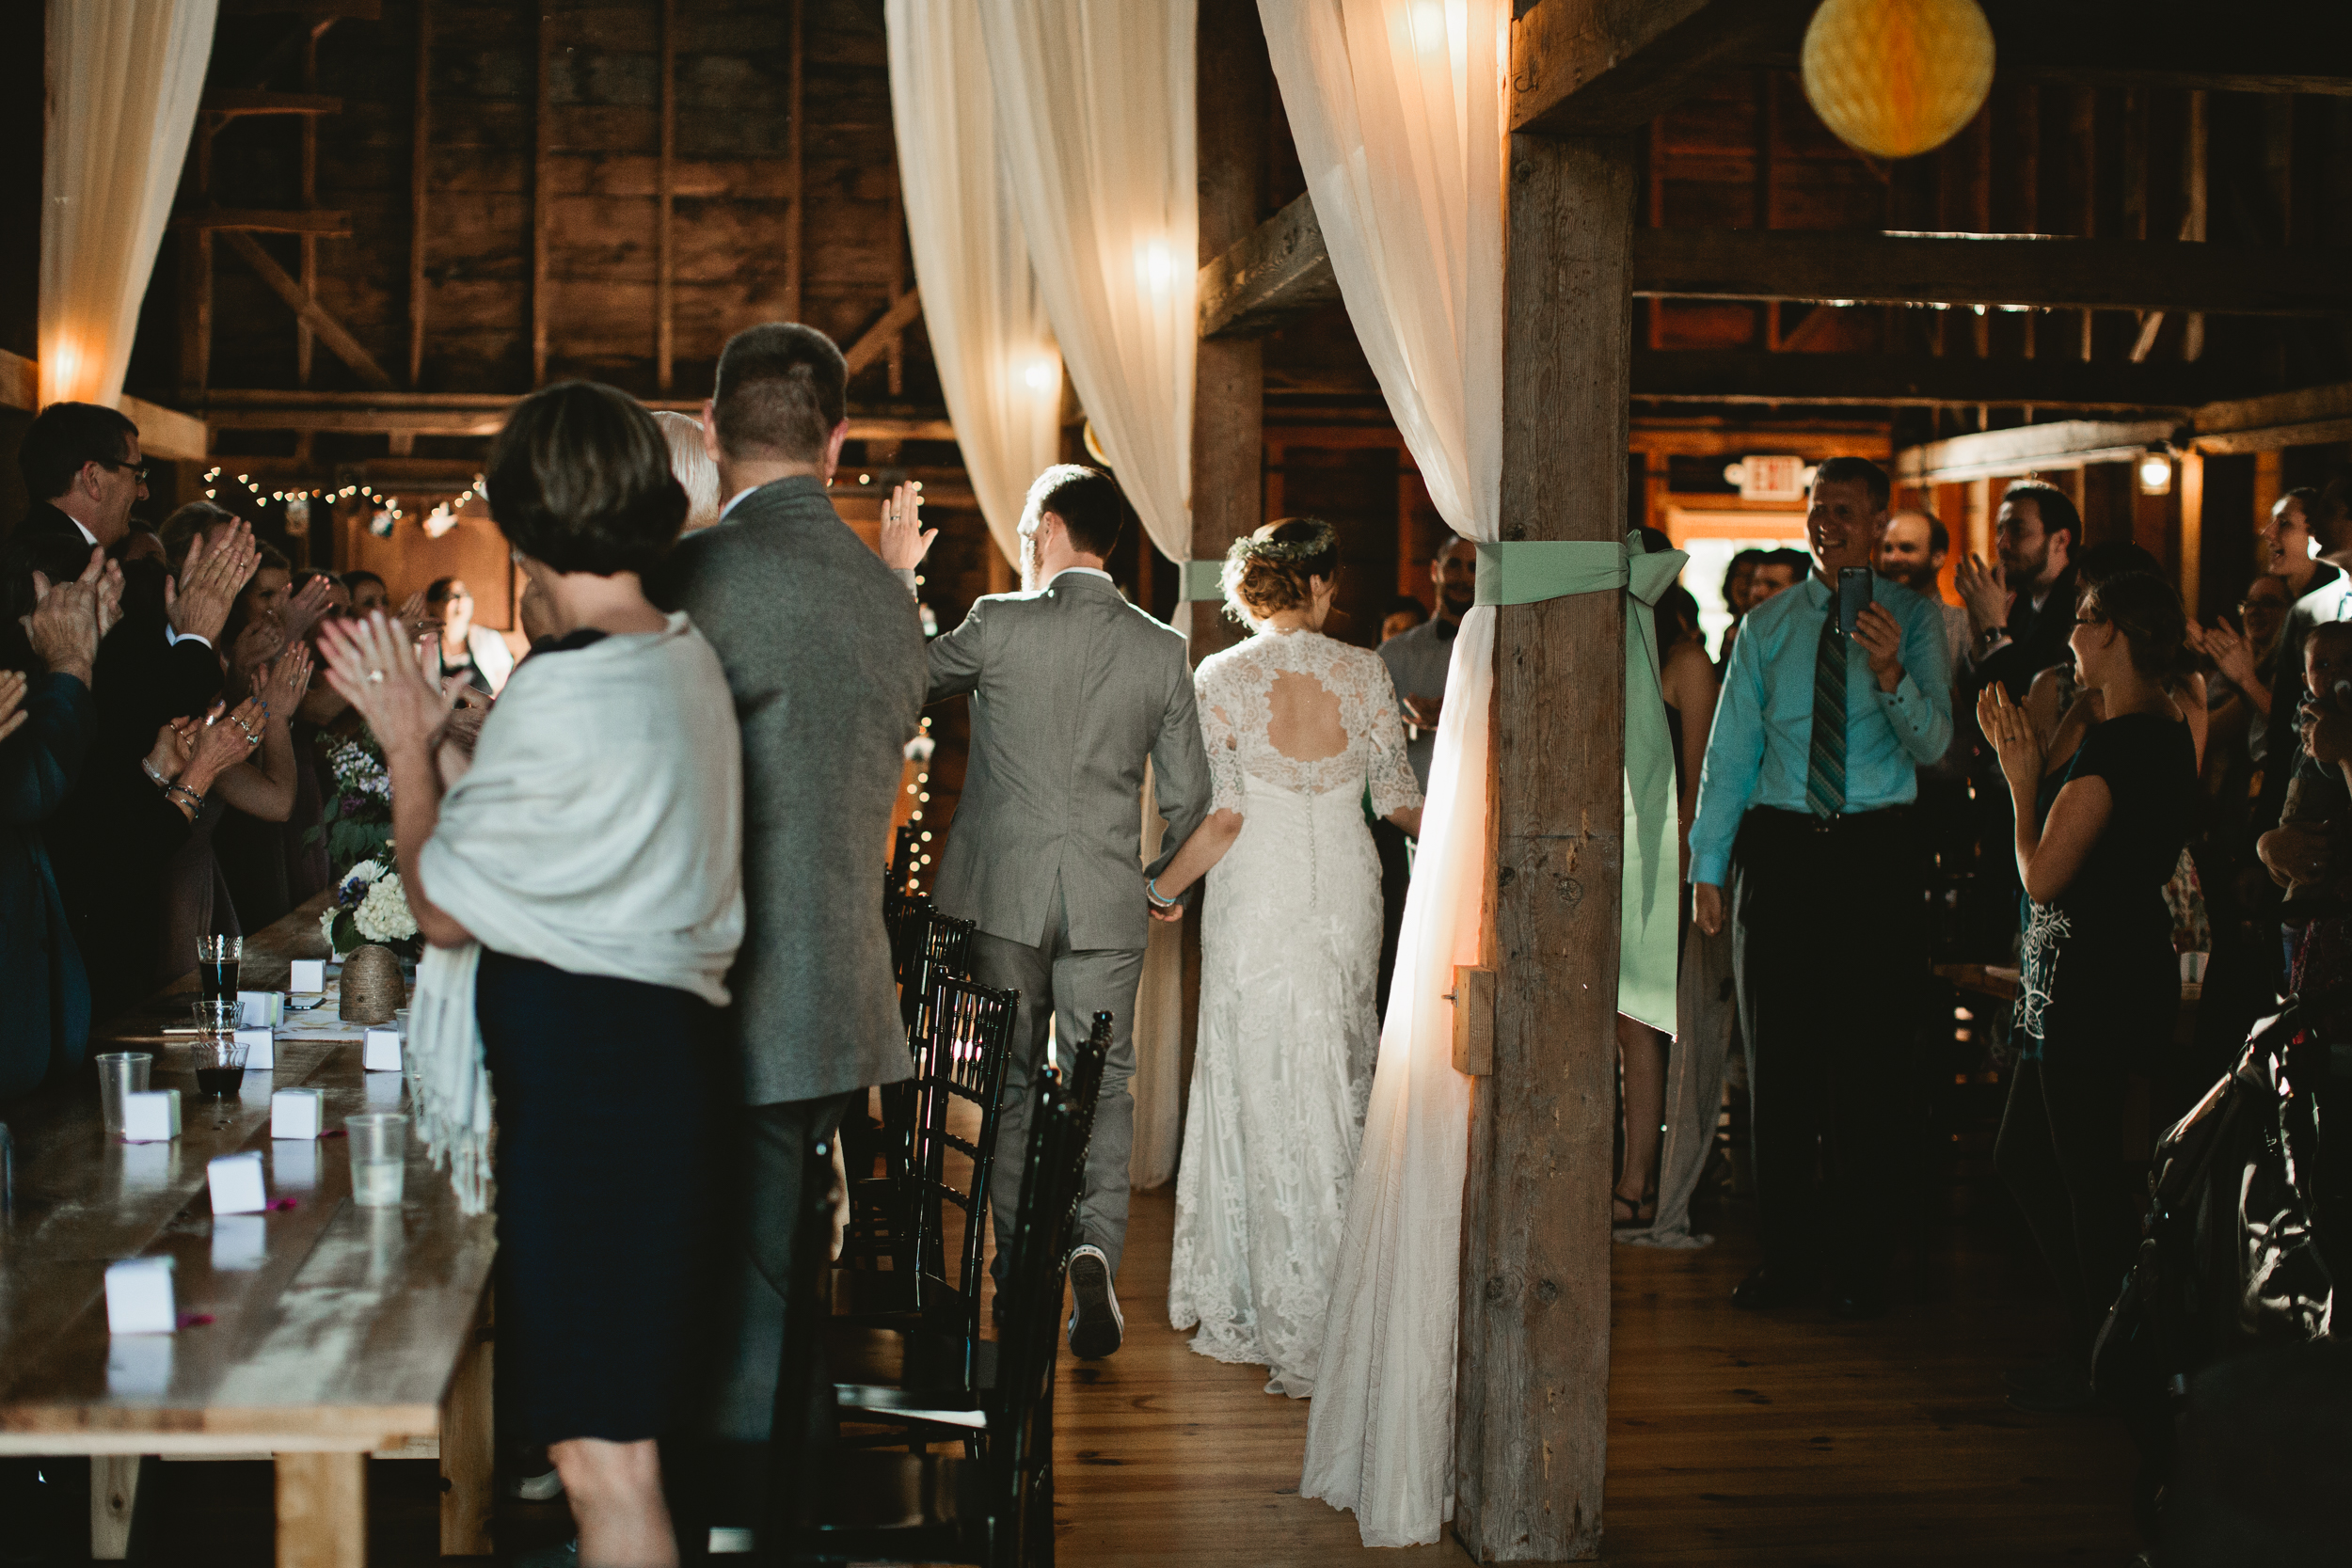 Spring-Meadows-Maine-Wedding-166.jpg